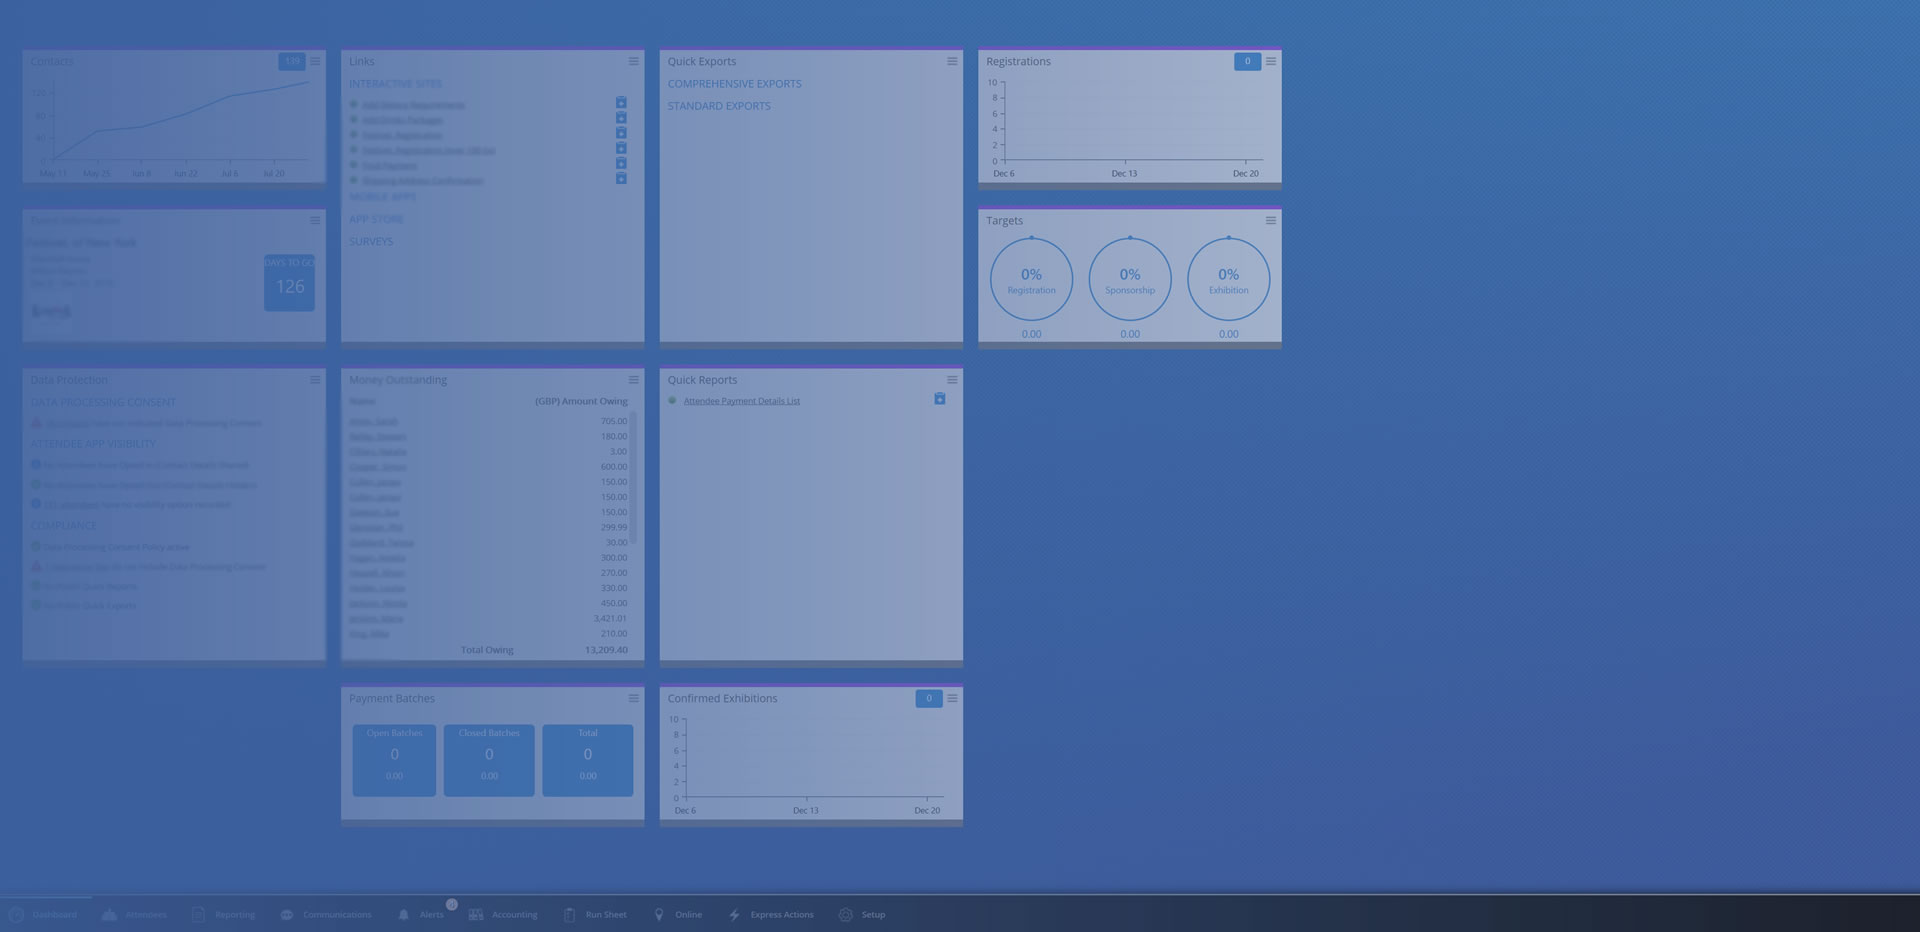 ereg example dashboard